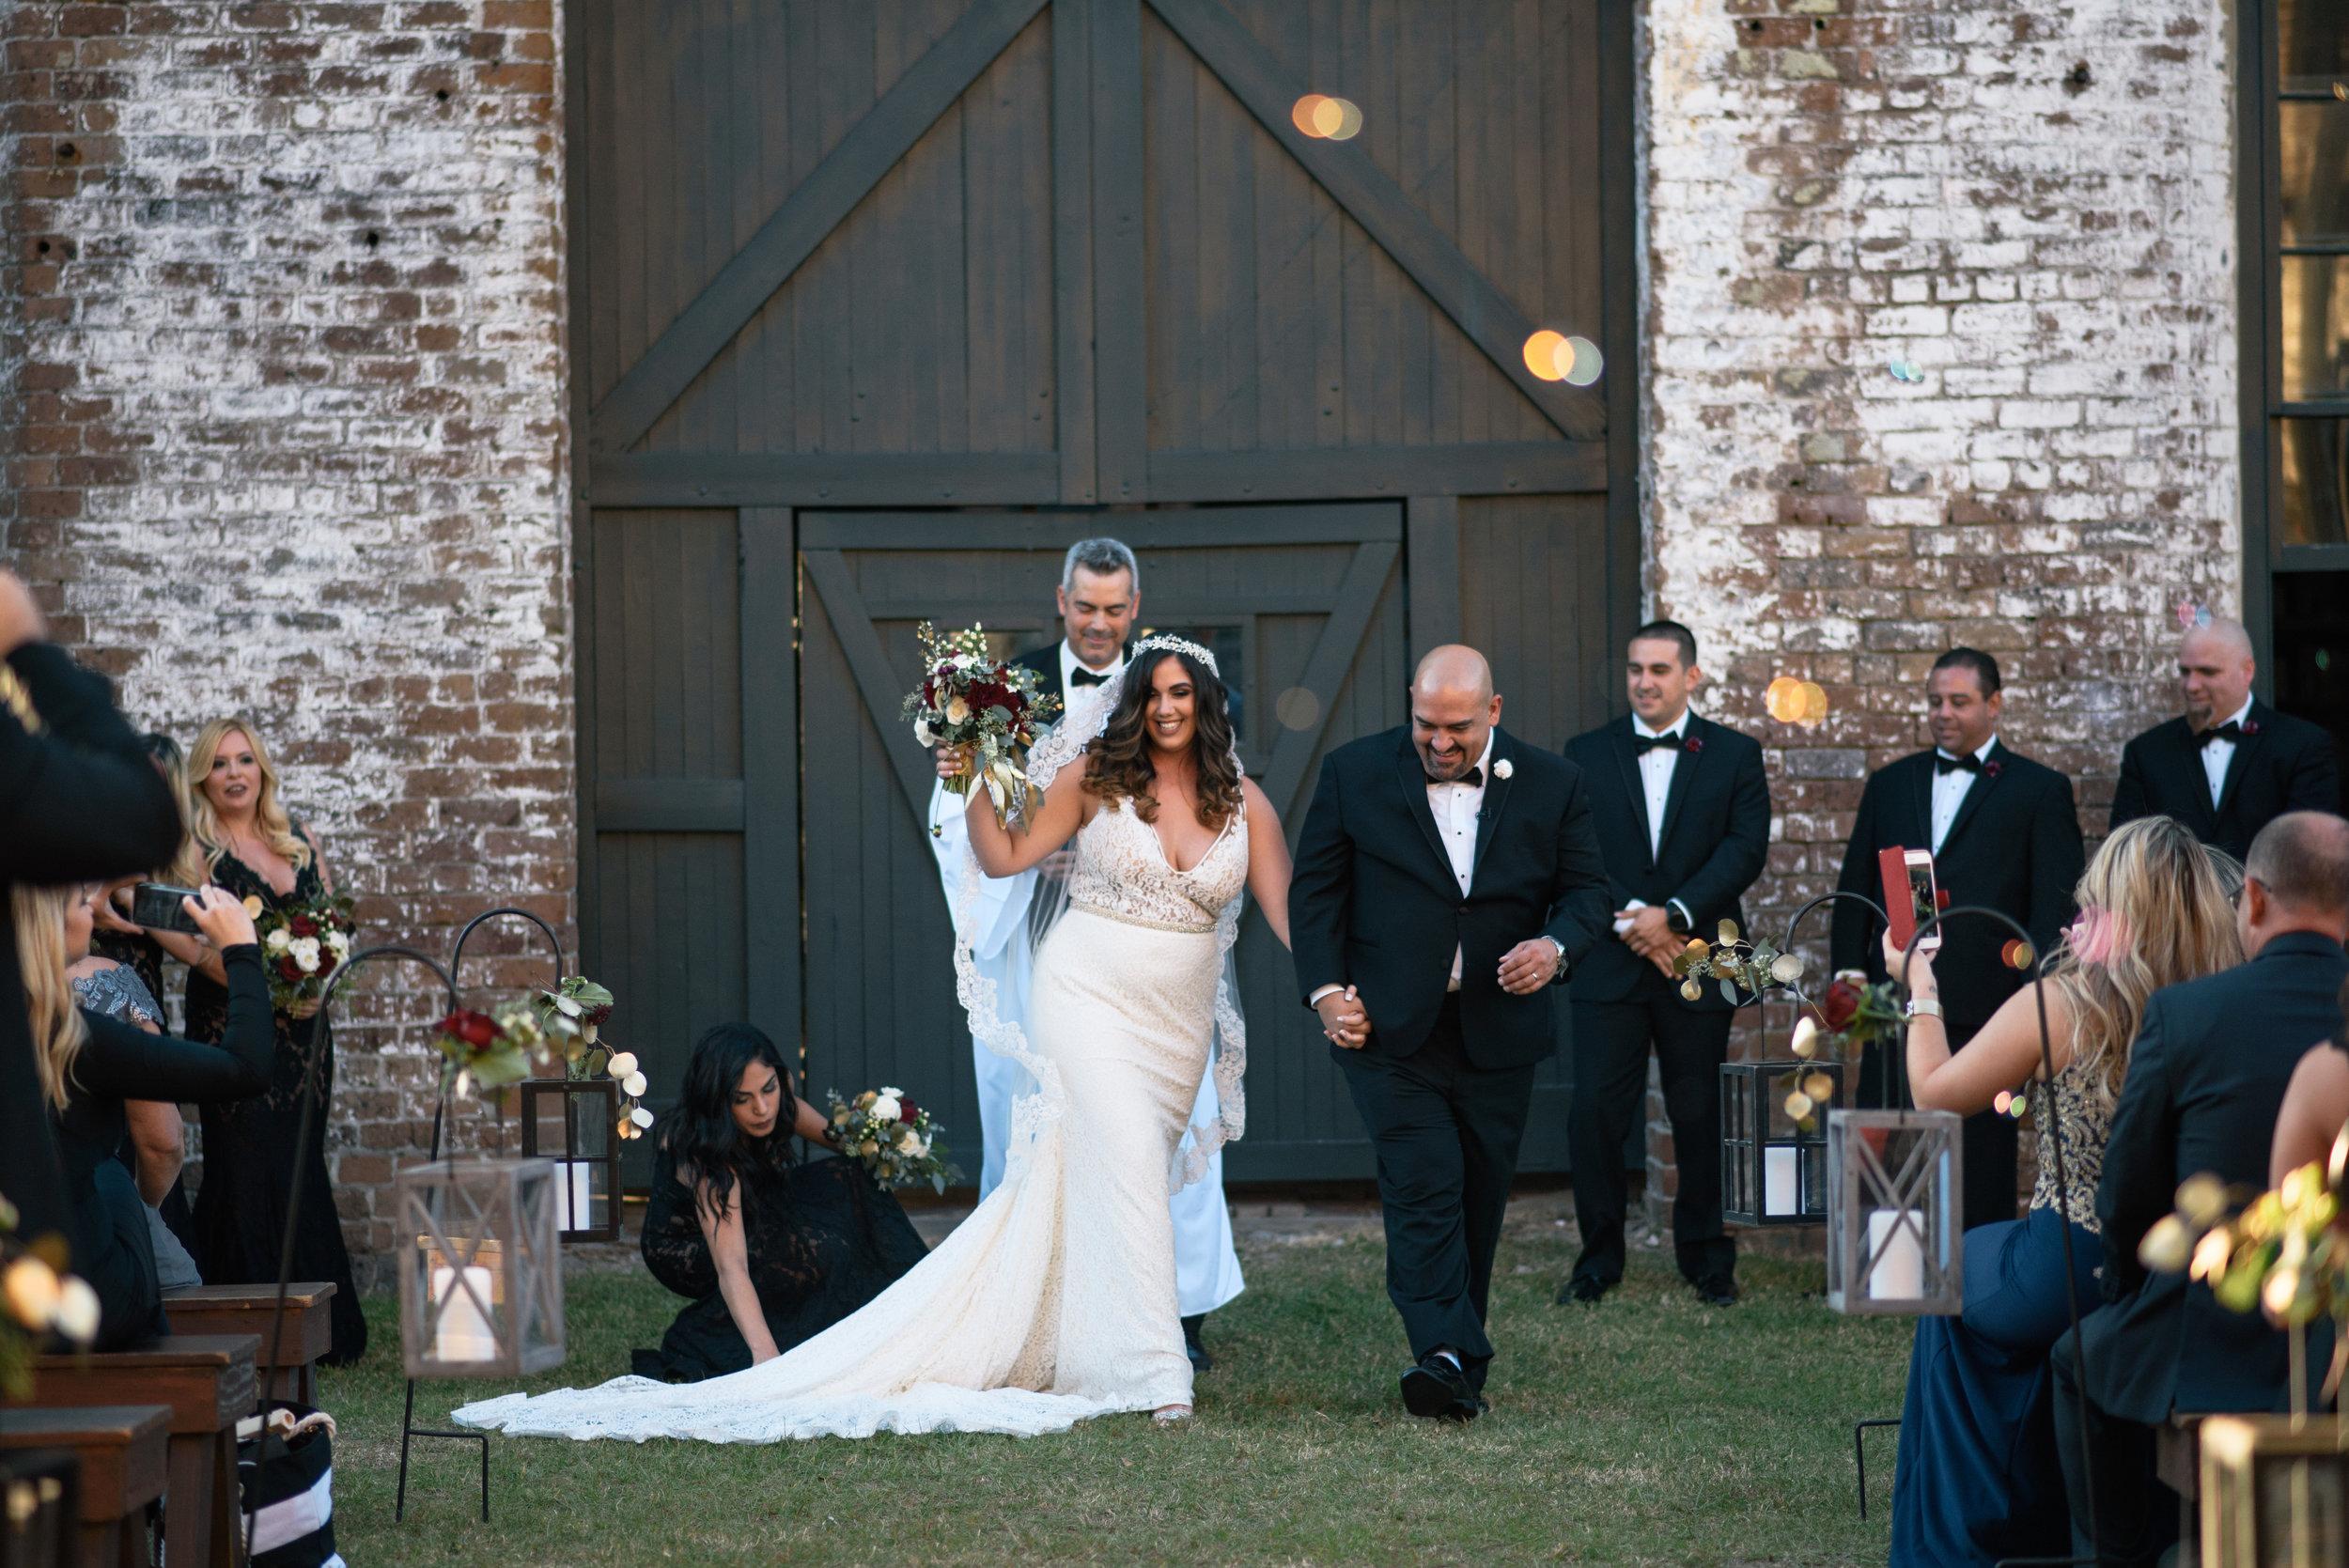 Iggy-and-yesenia-savannah-railroad-museum-wedding-meg-hill-photo- (499 of 1037).jpg